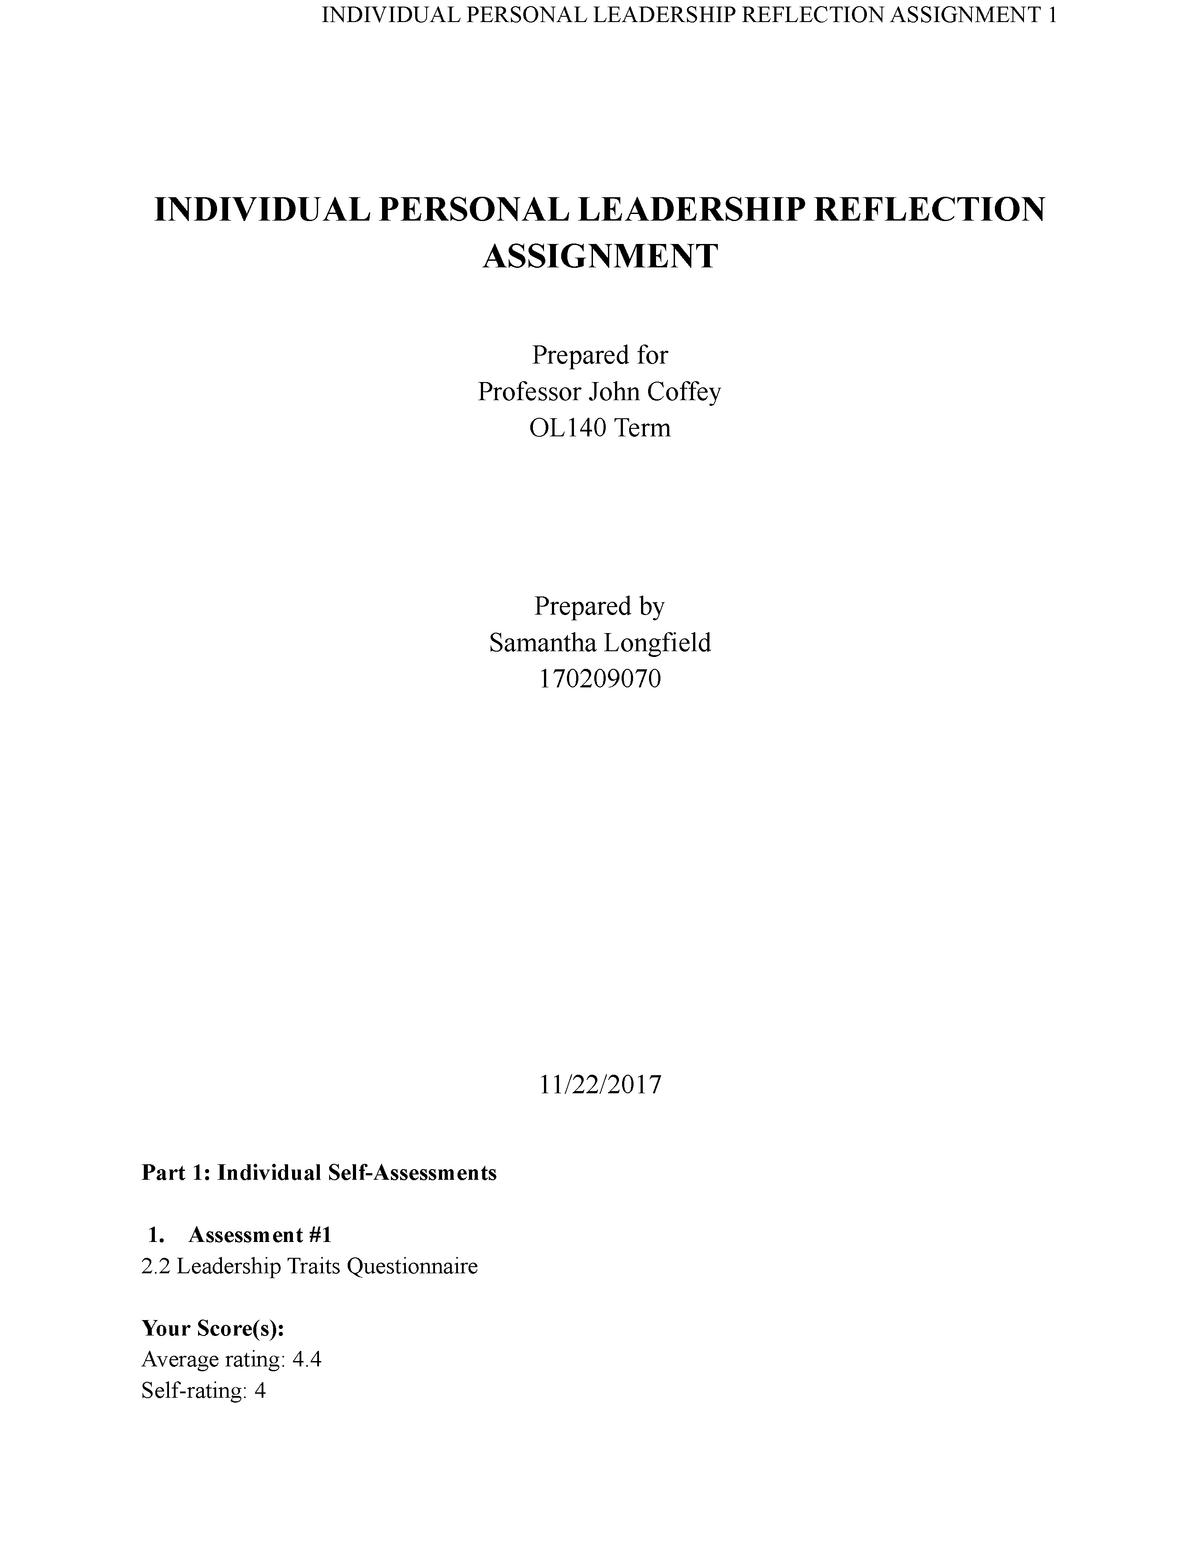 OL140 Self Assessment - Professor: Dr  Coffey - OL140